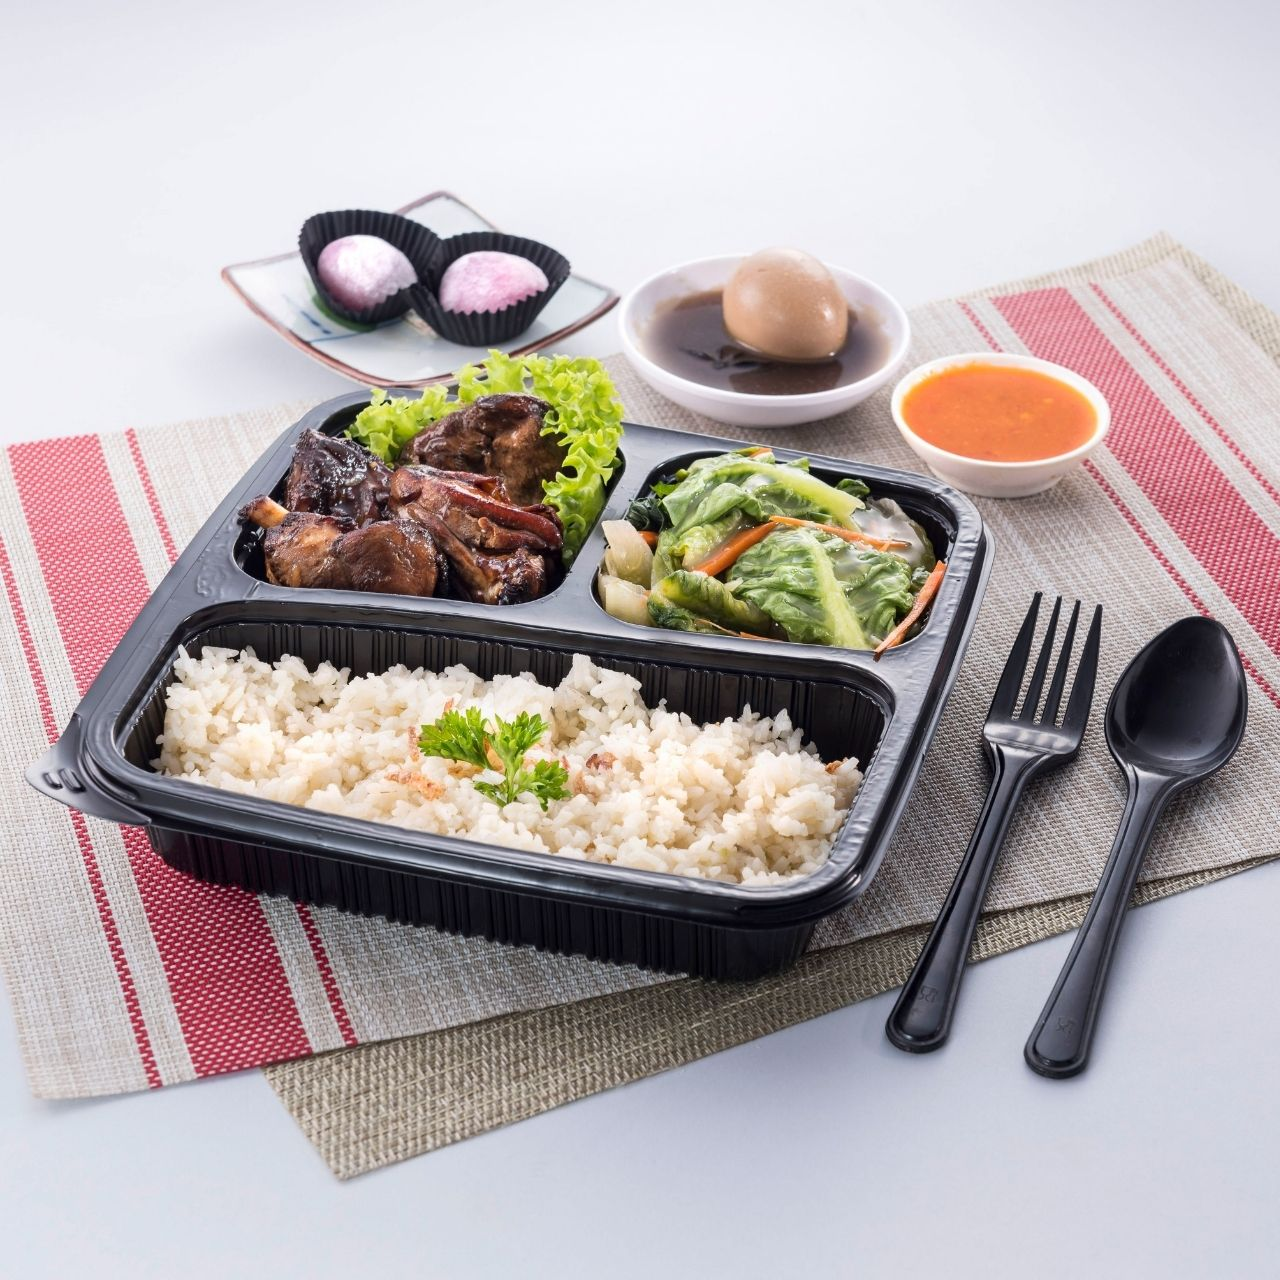 runningmen catering bento box butter rice chicken with roasted chicken